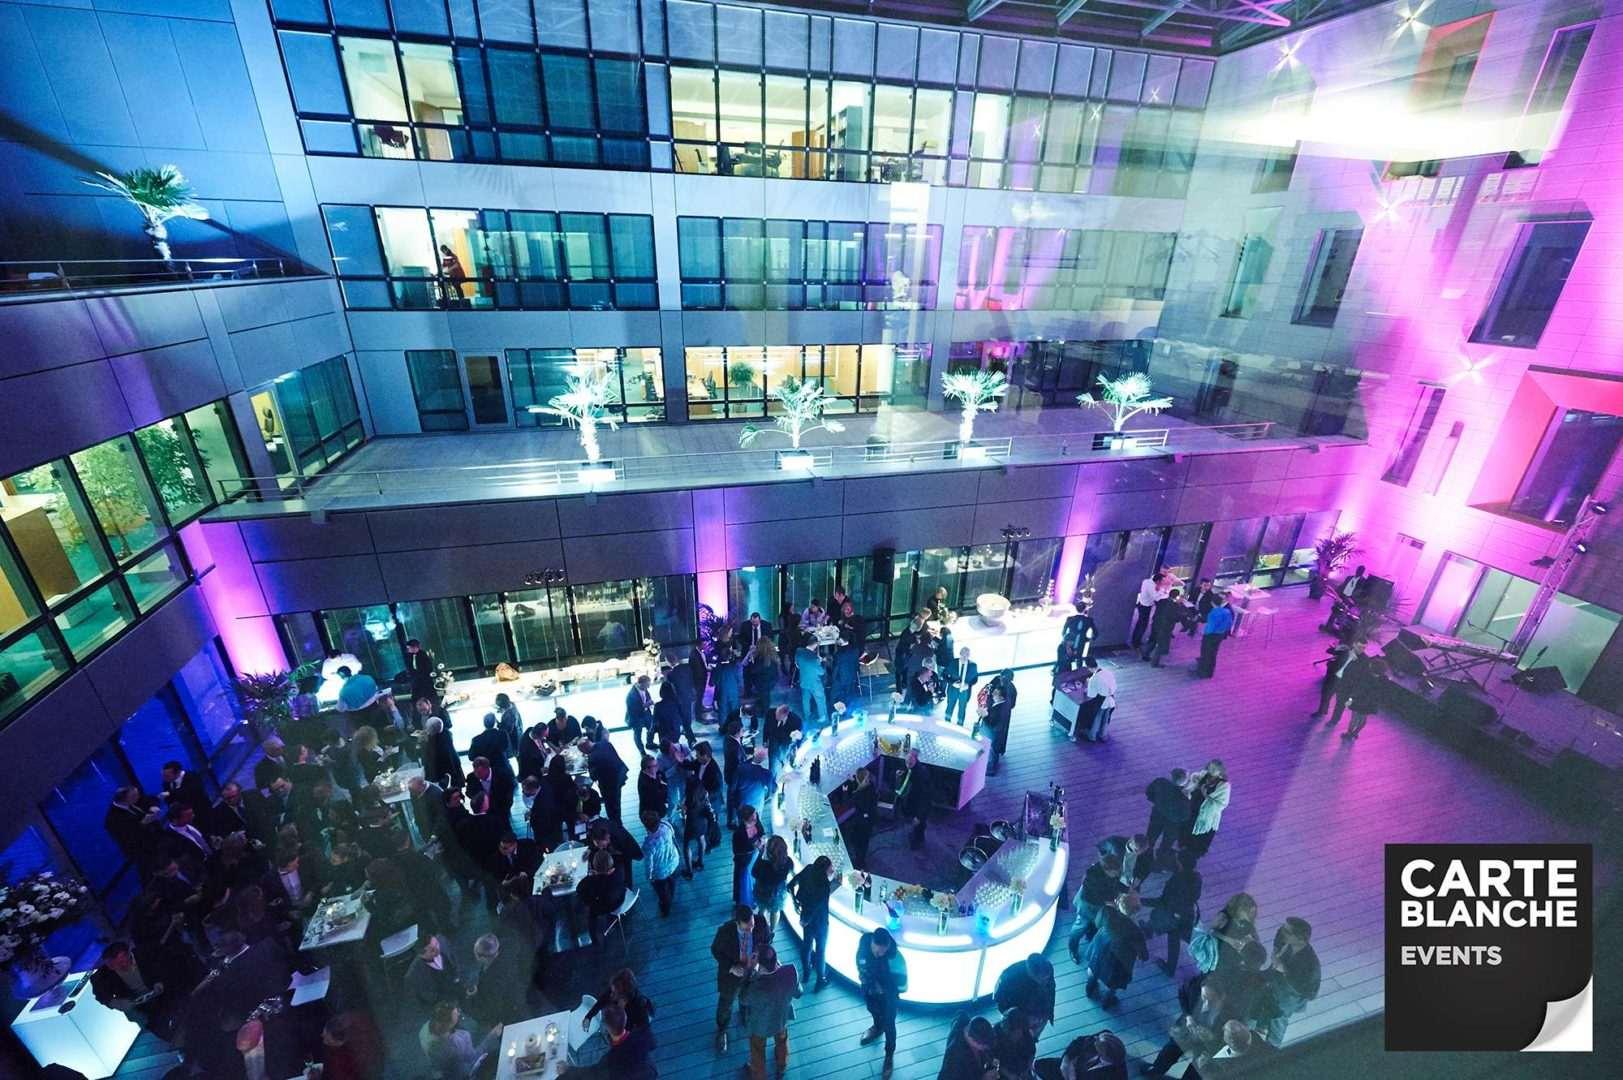 xmas-degroof-petercam-2015-038-luxembourg-event